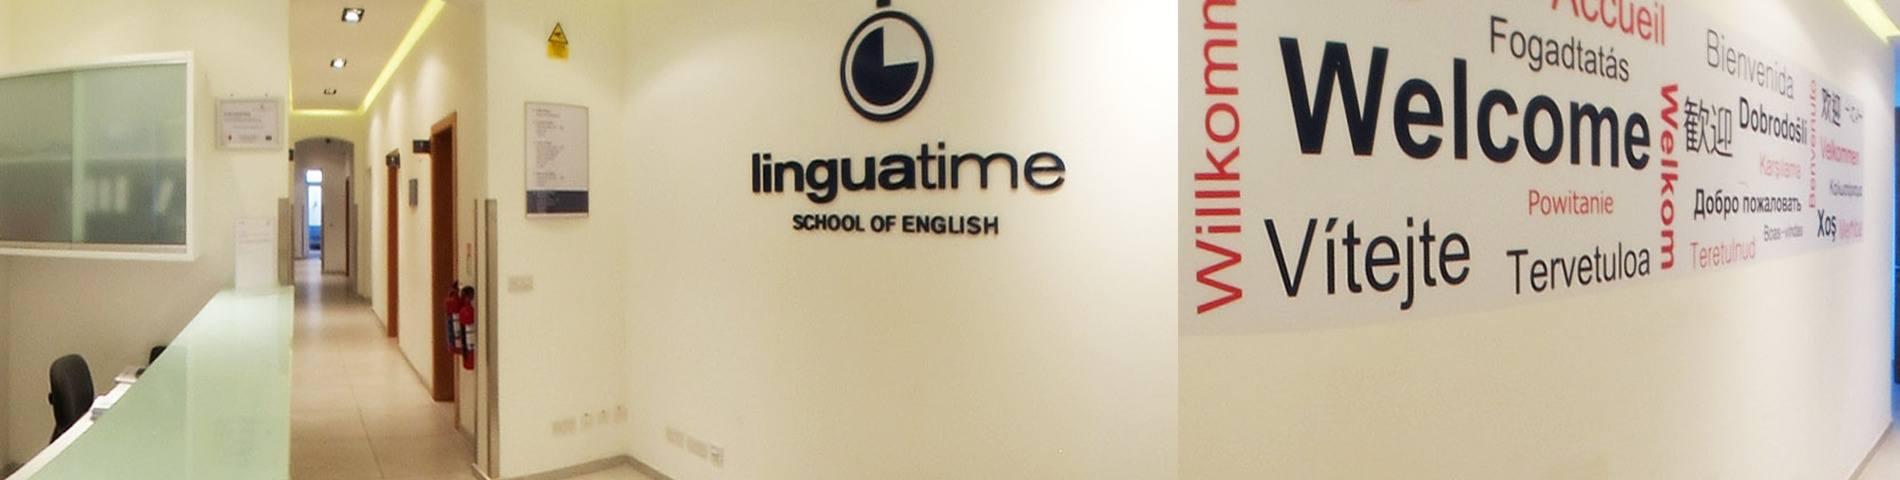 Linguatime School of English bild 1